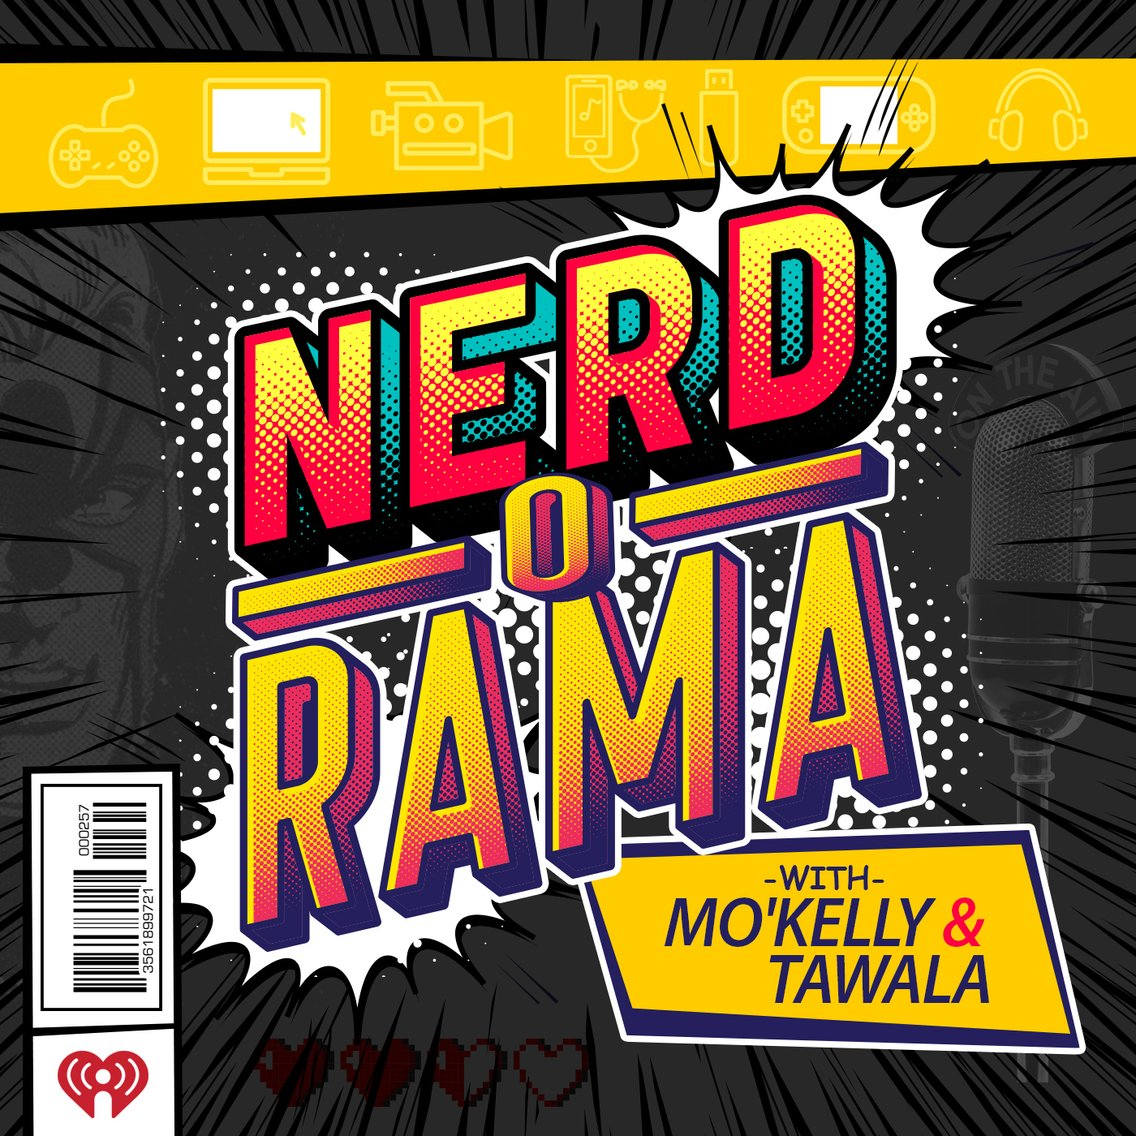 Nerd-O-Rama with Mo'Kelly & Tawala! - imagen de portada